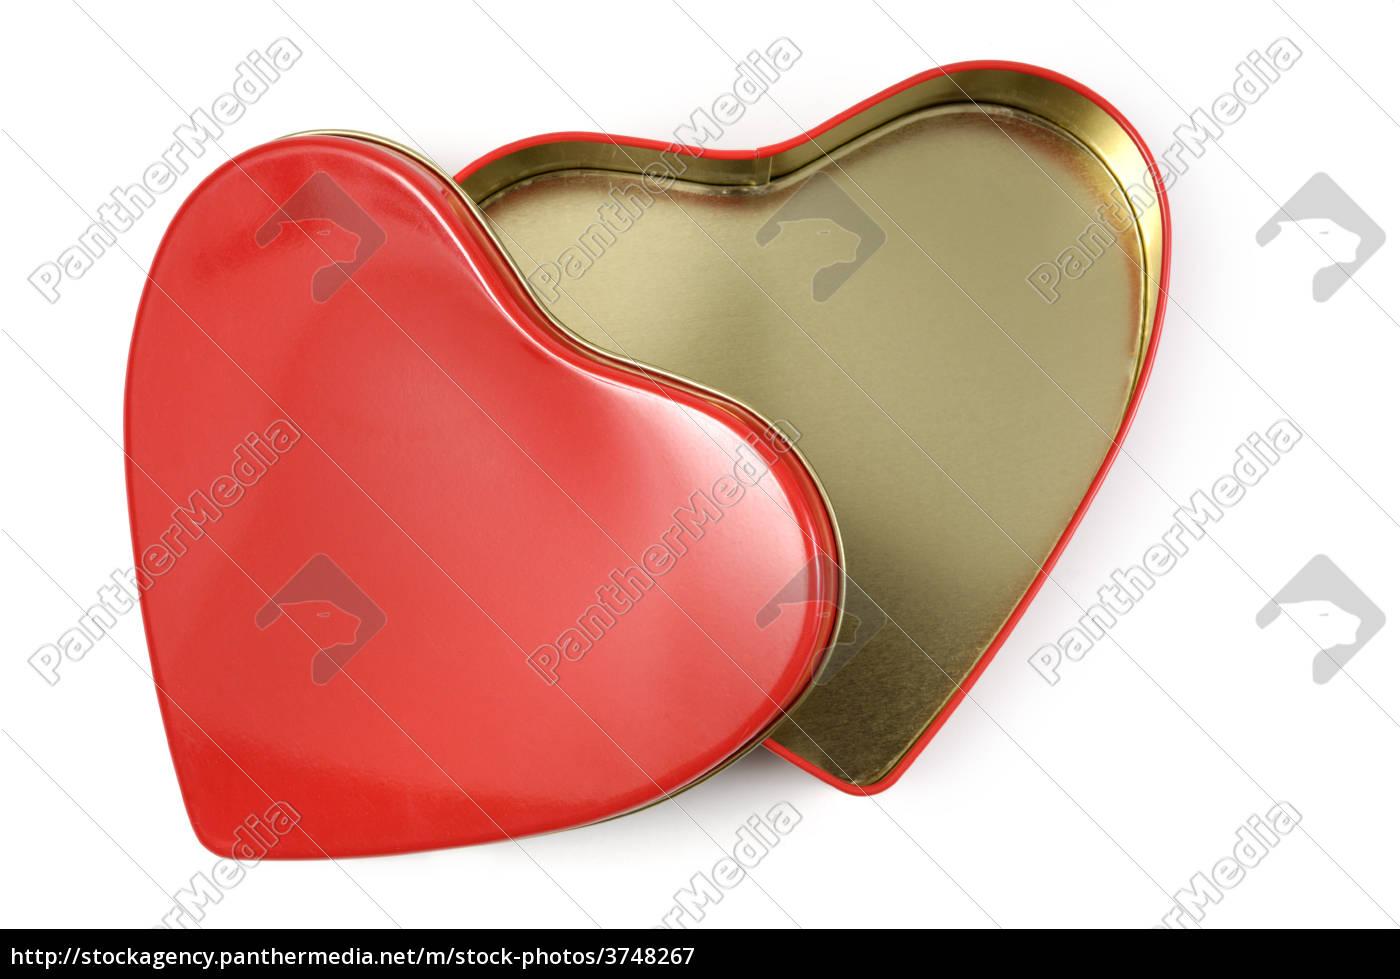 open heart-shaped gift box - 3748267 ...  sc 1 st  PantherMedia & Open Heart-shaped Gift Box - Stock Photo - #3748267 - PantherMedia ...